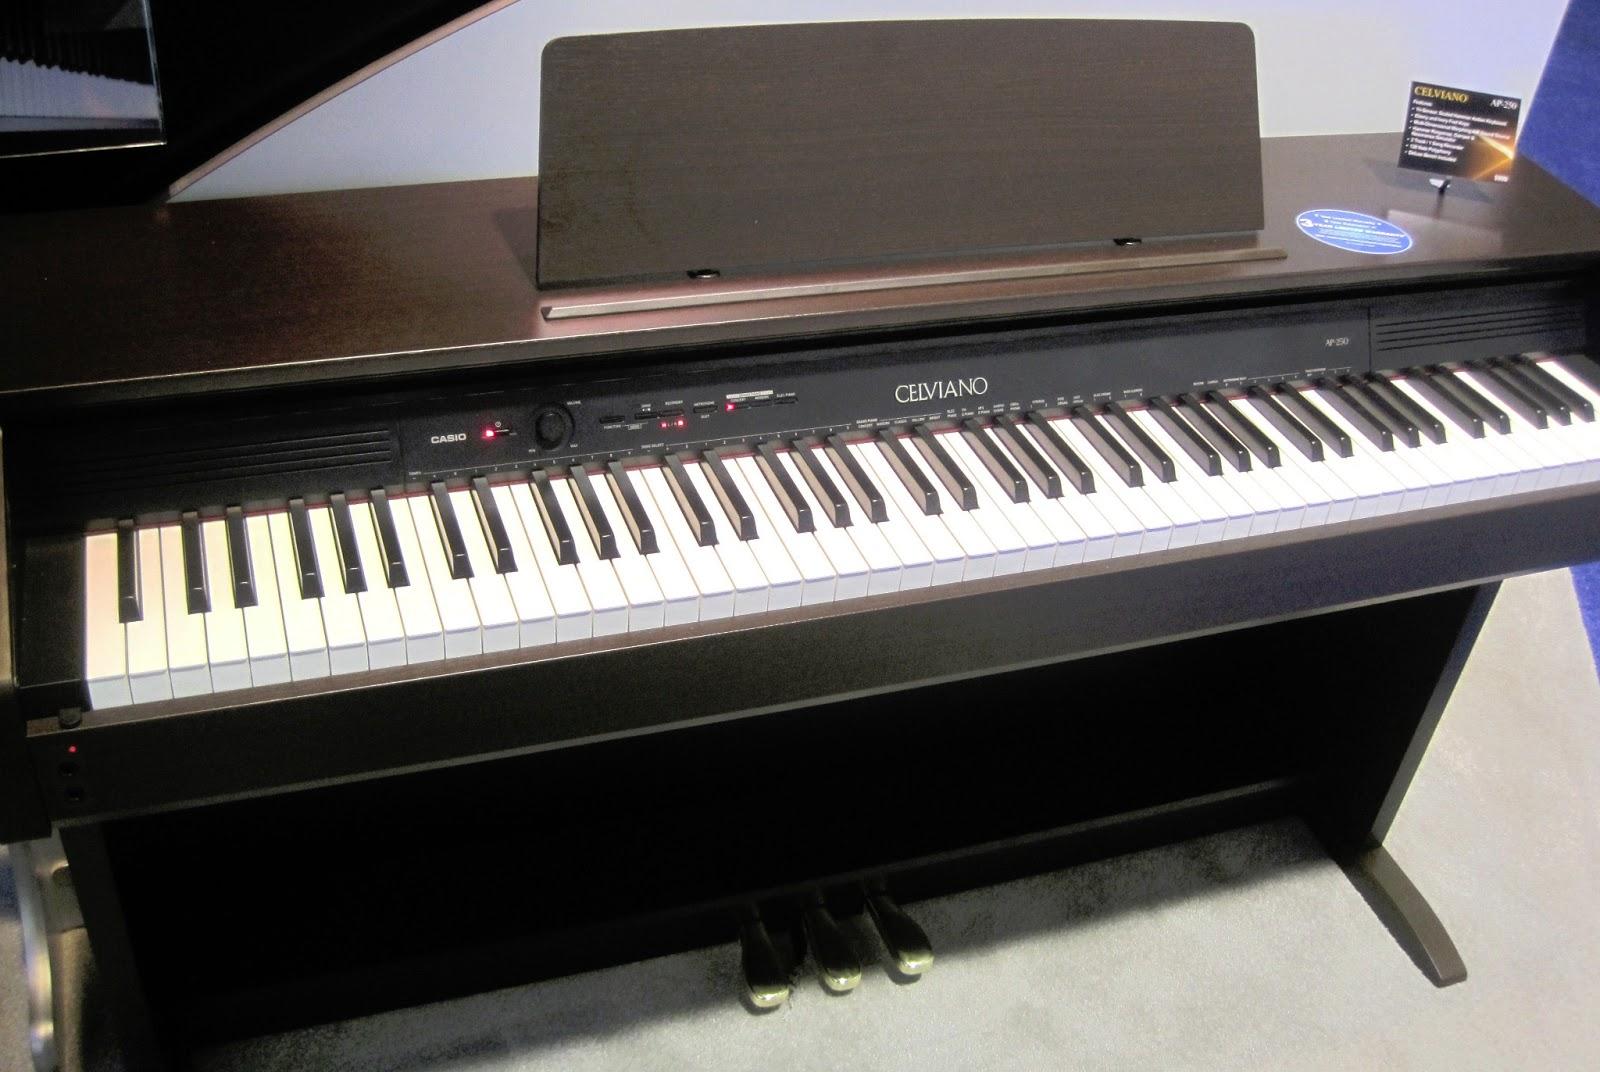 az piano reviews review casio ap250 digital piano impressive under 1000 recommended. Black Bedroom Furniture Sets. Home Design Ideas